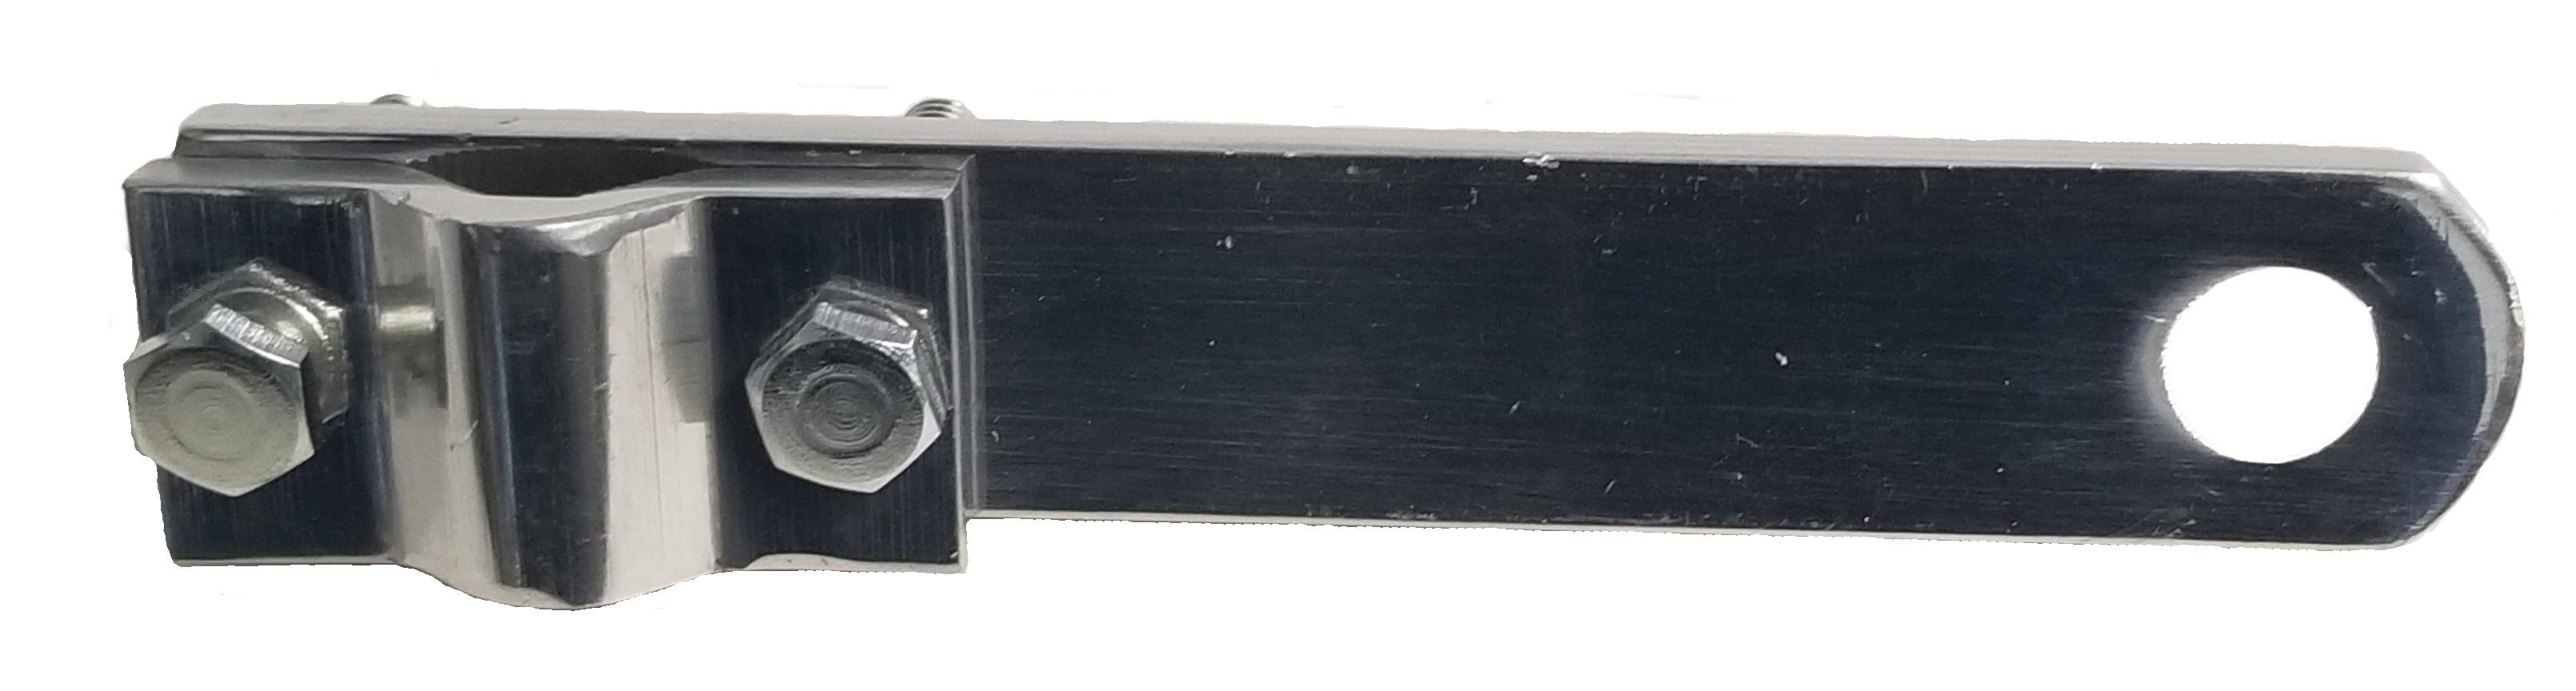 JBC331 - ProComm Skinny Mirror Mount Without Stud (Bulk)